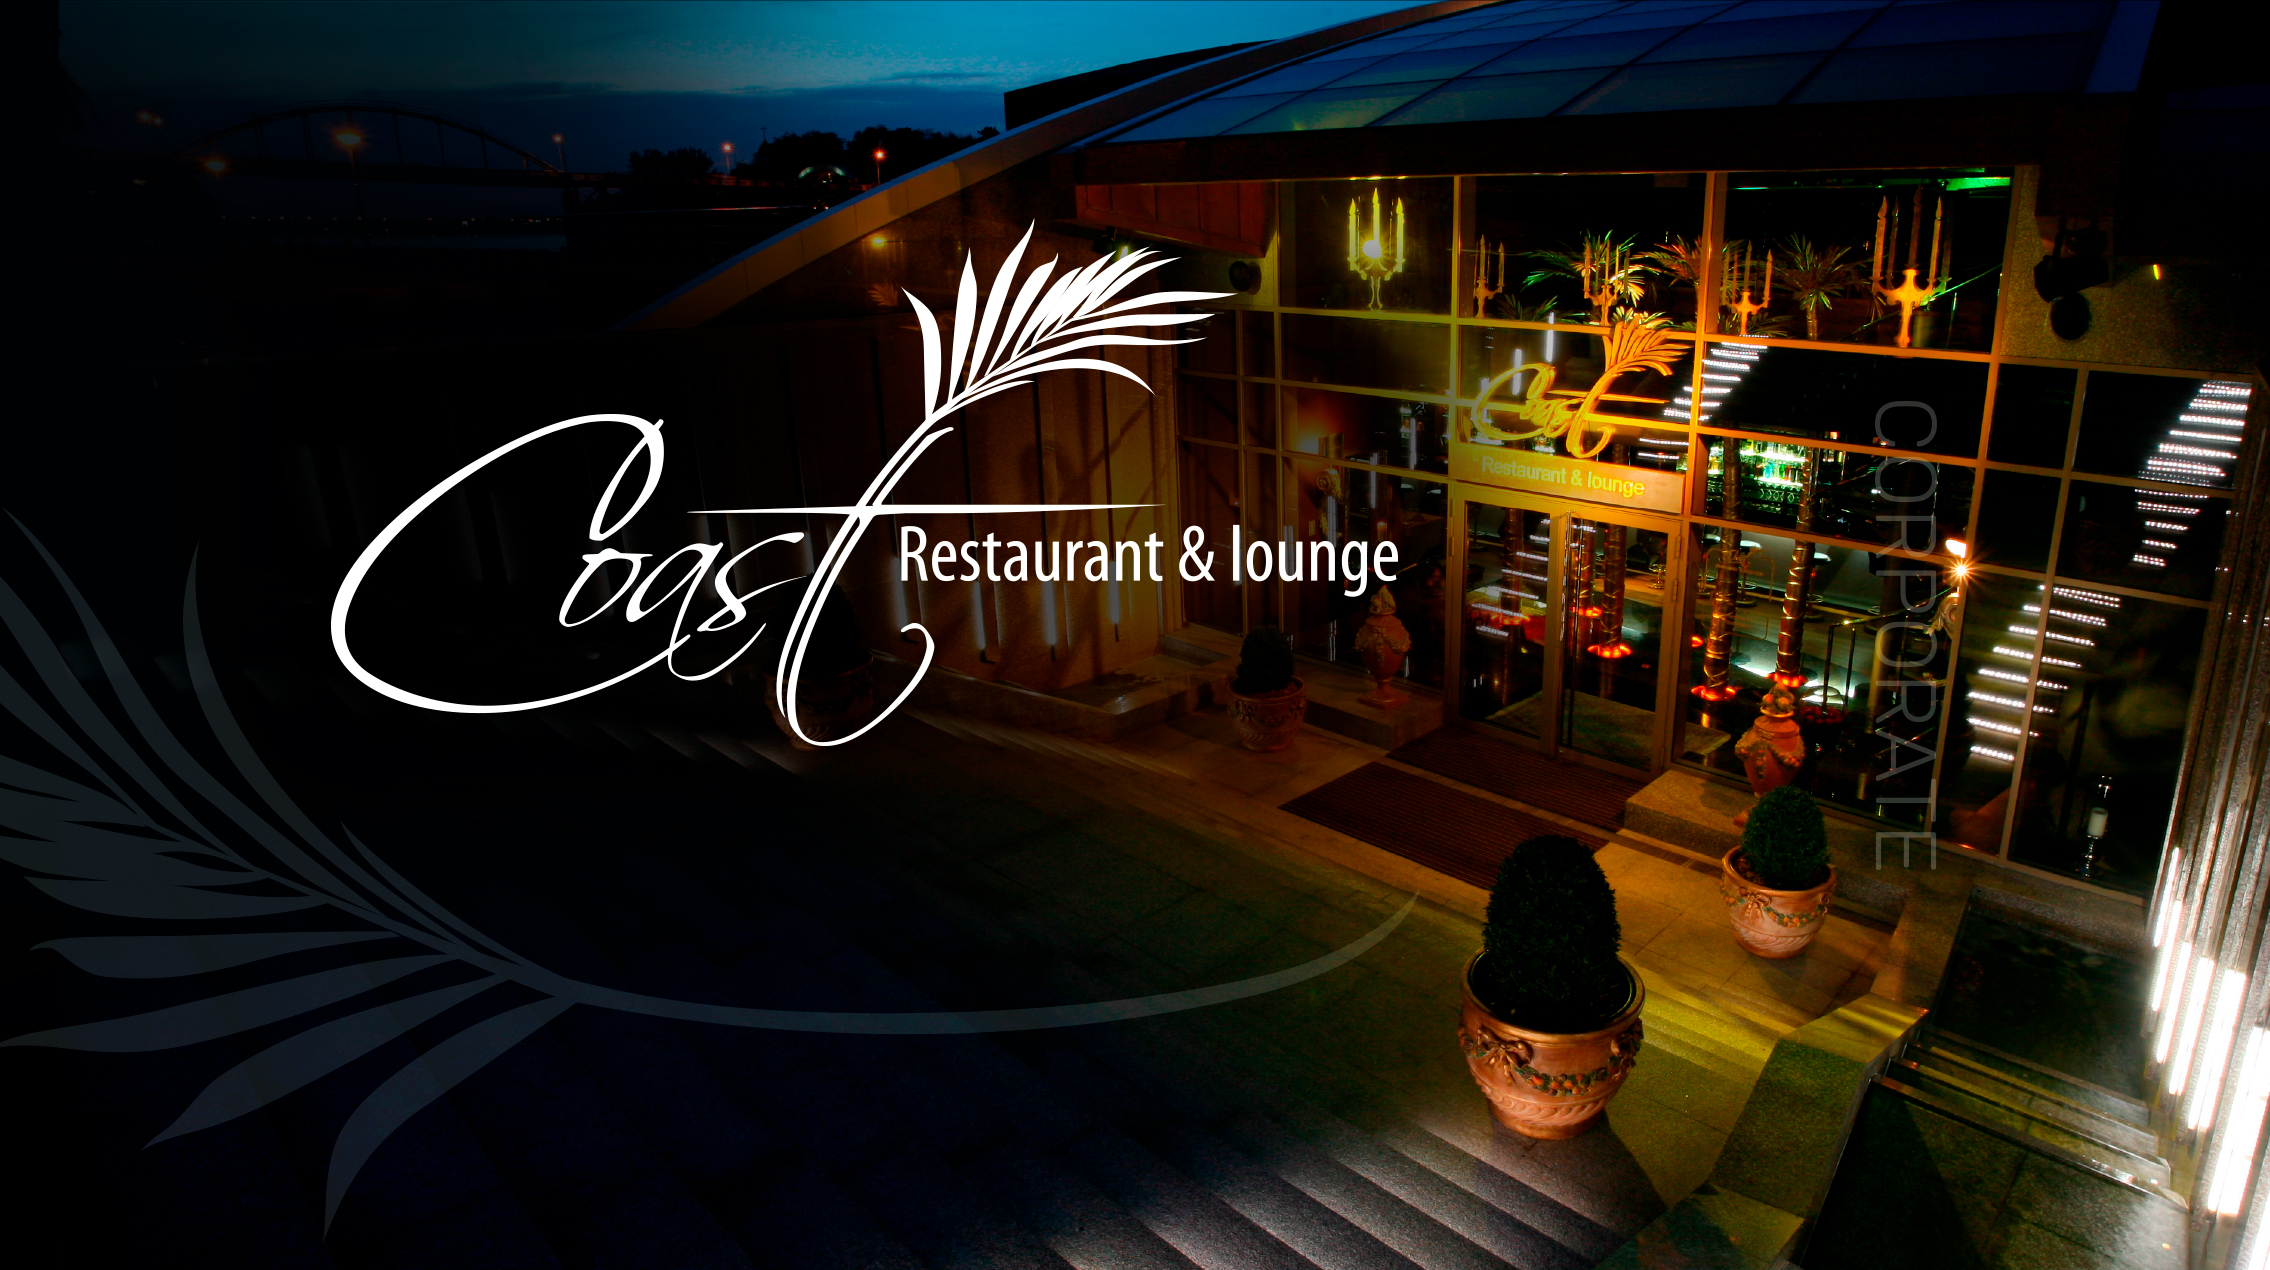 Создание корпоративного сайта для ресторана Coast